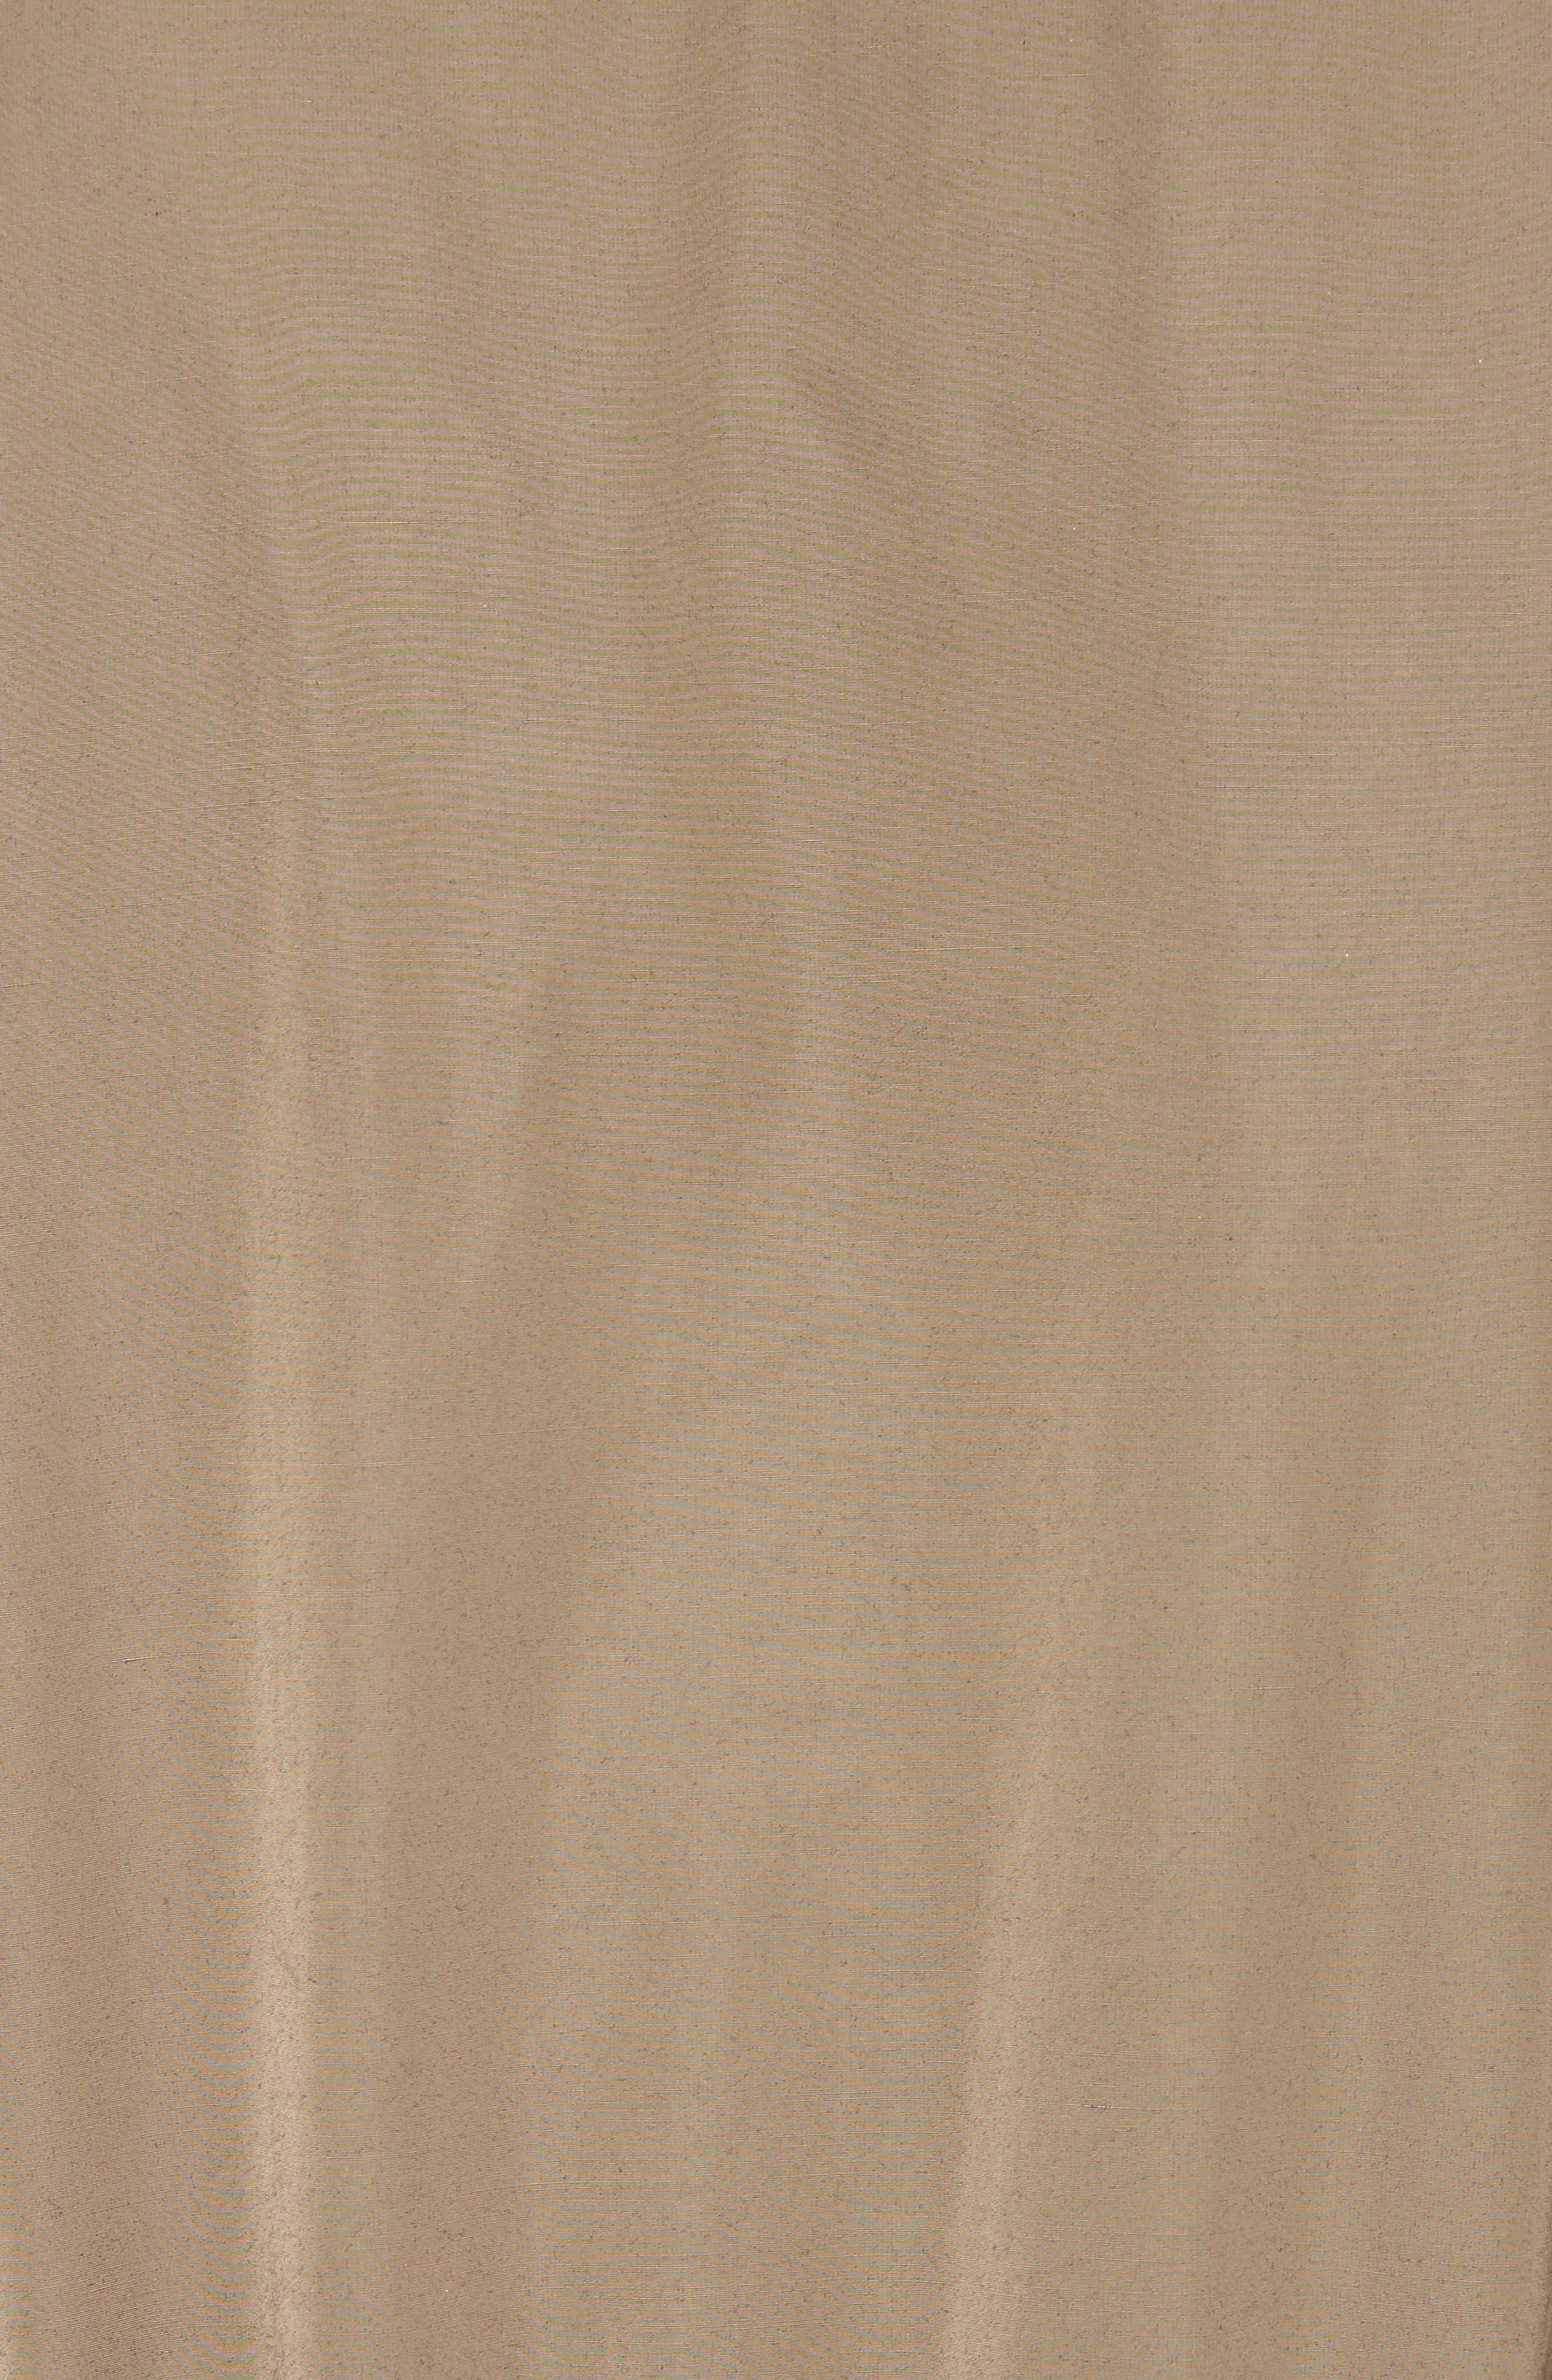 Cinch Waist Army Dress,                             Alternate thumbnail 5, color,                             Cacao Brown